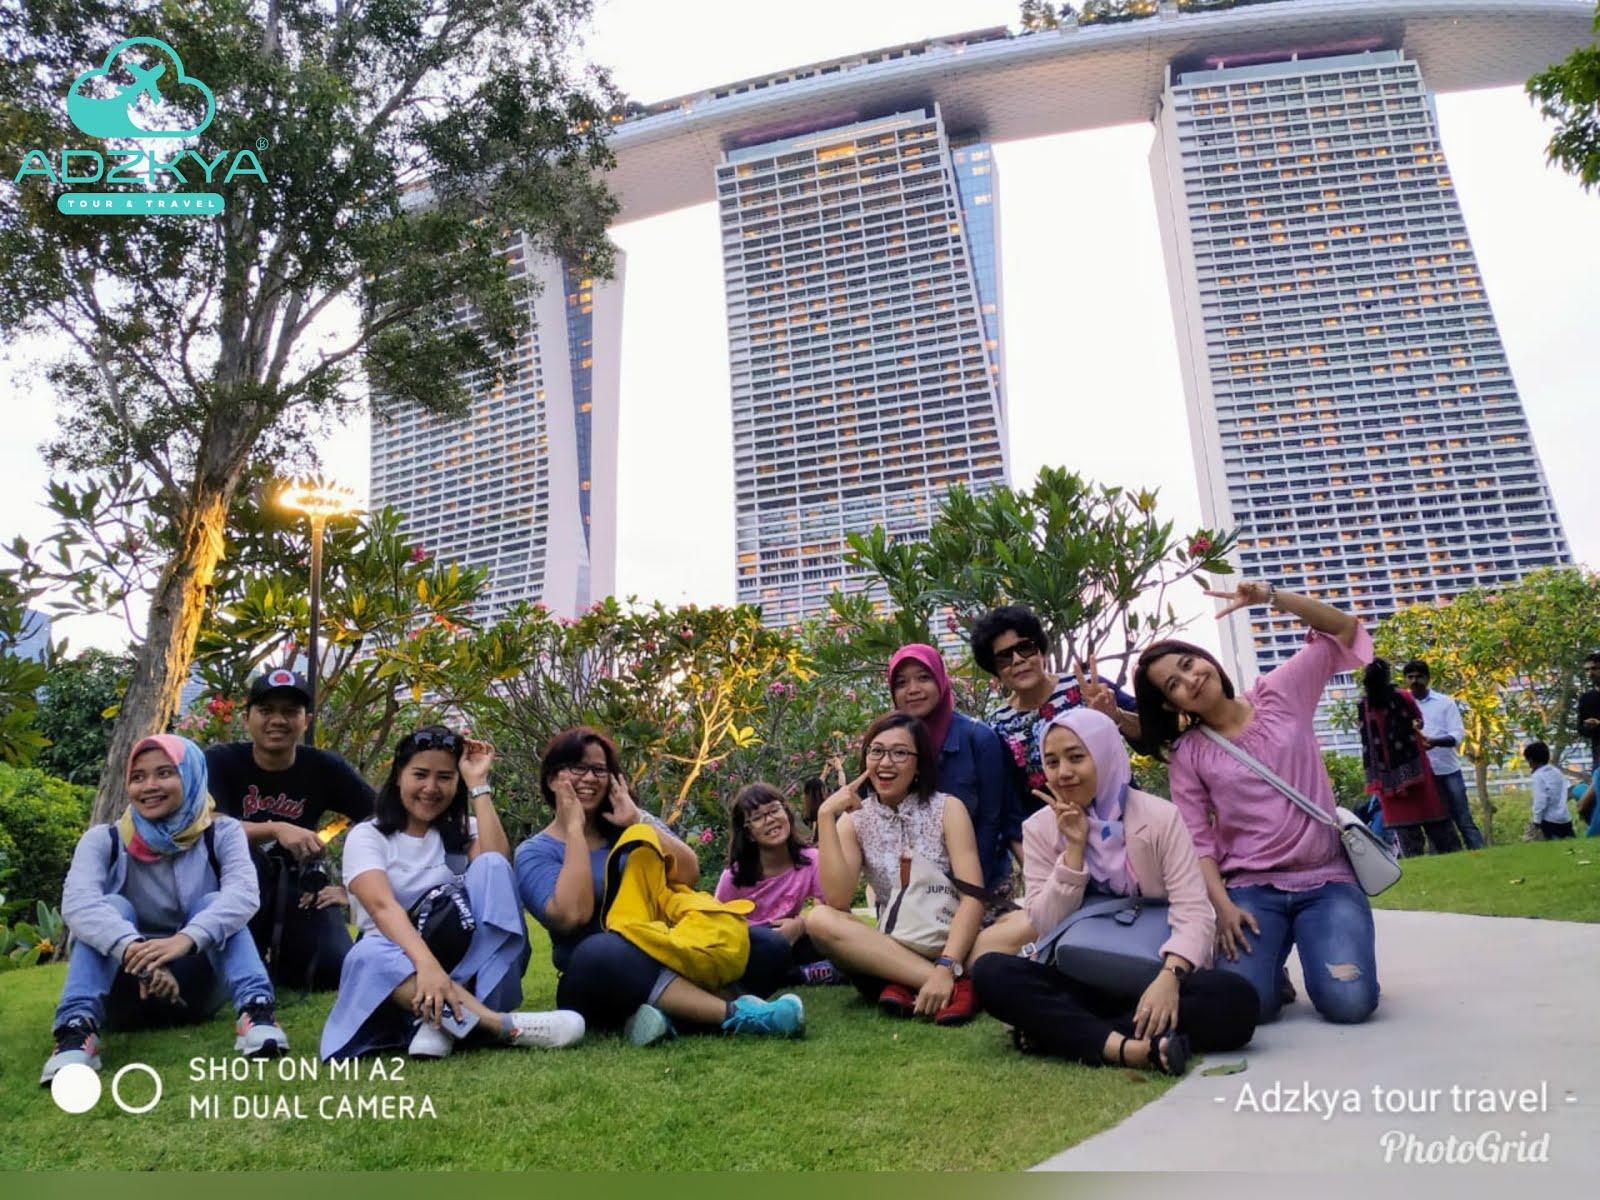 OPEN TRIP SINGAPORE 13 - 15 APRIL 2019